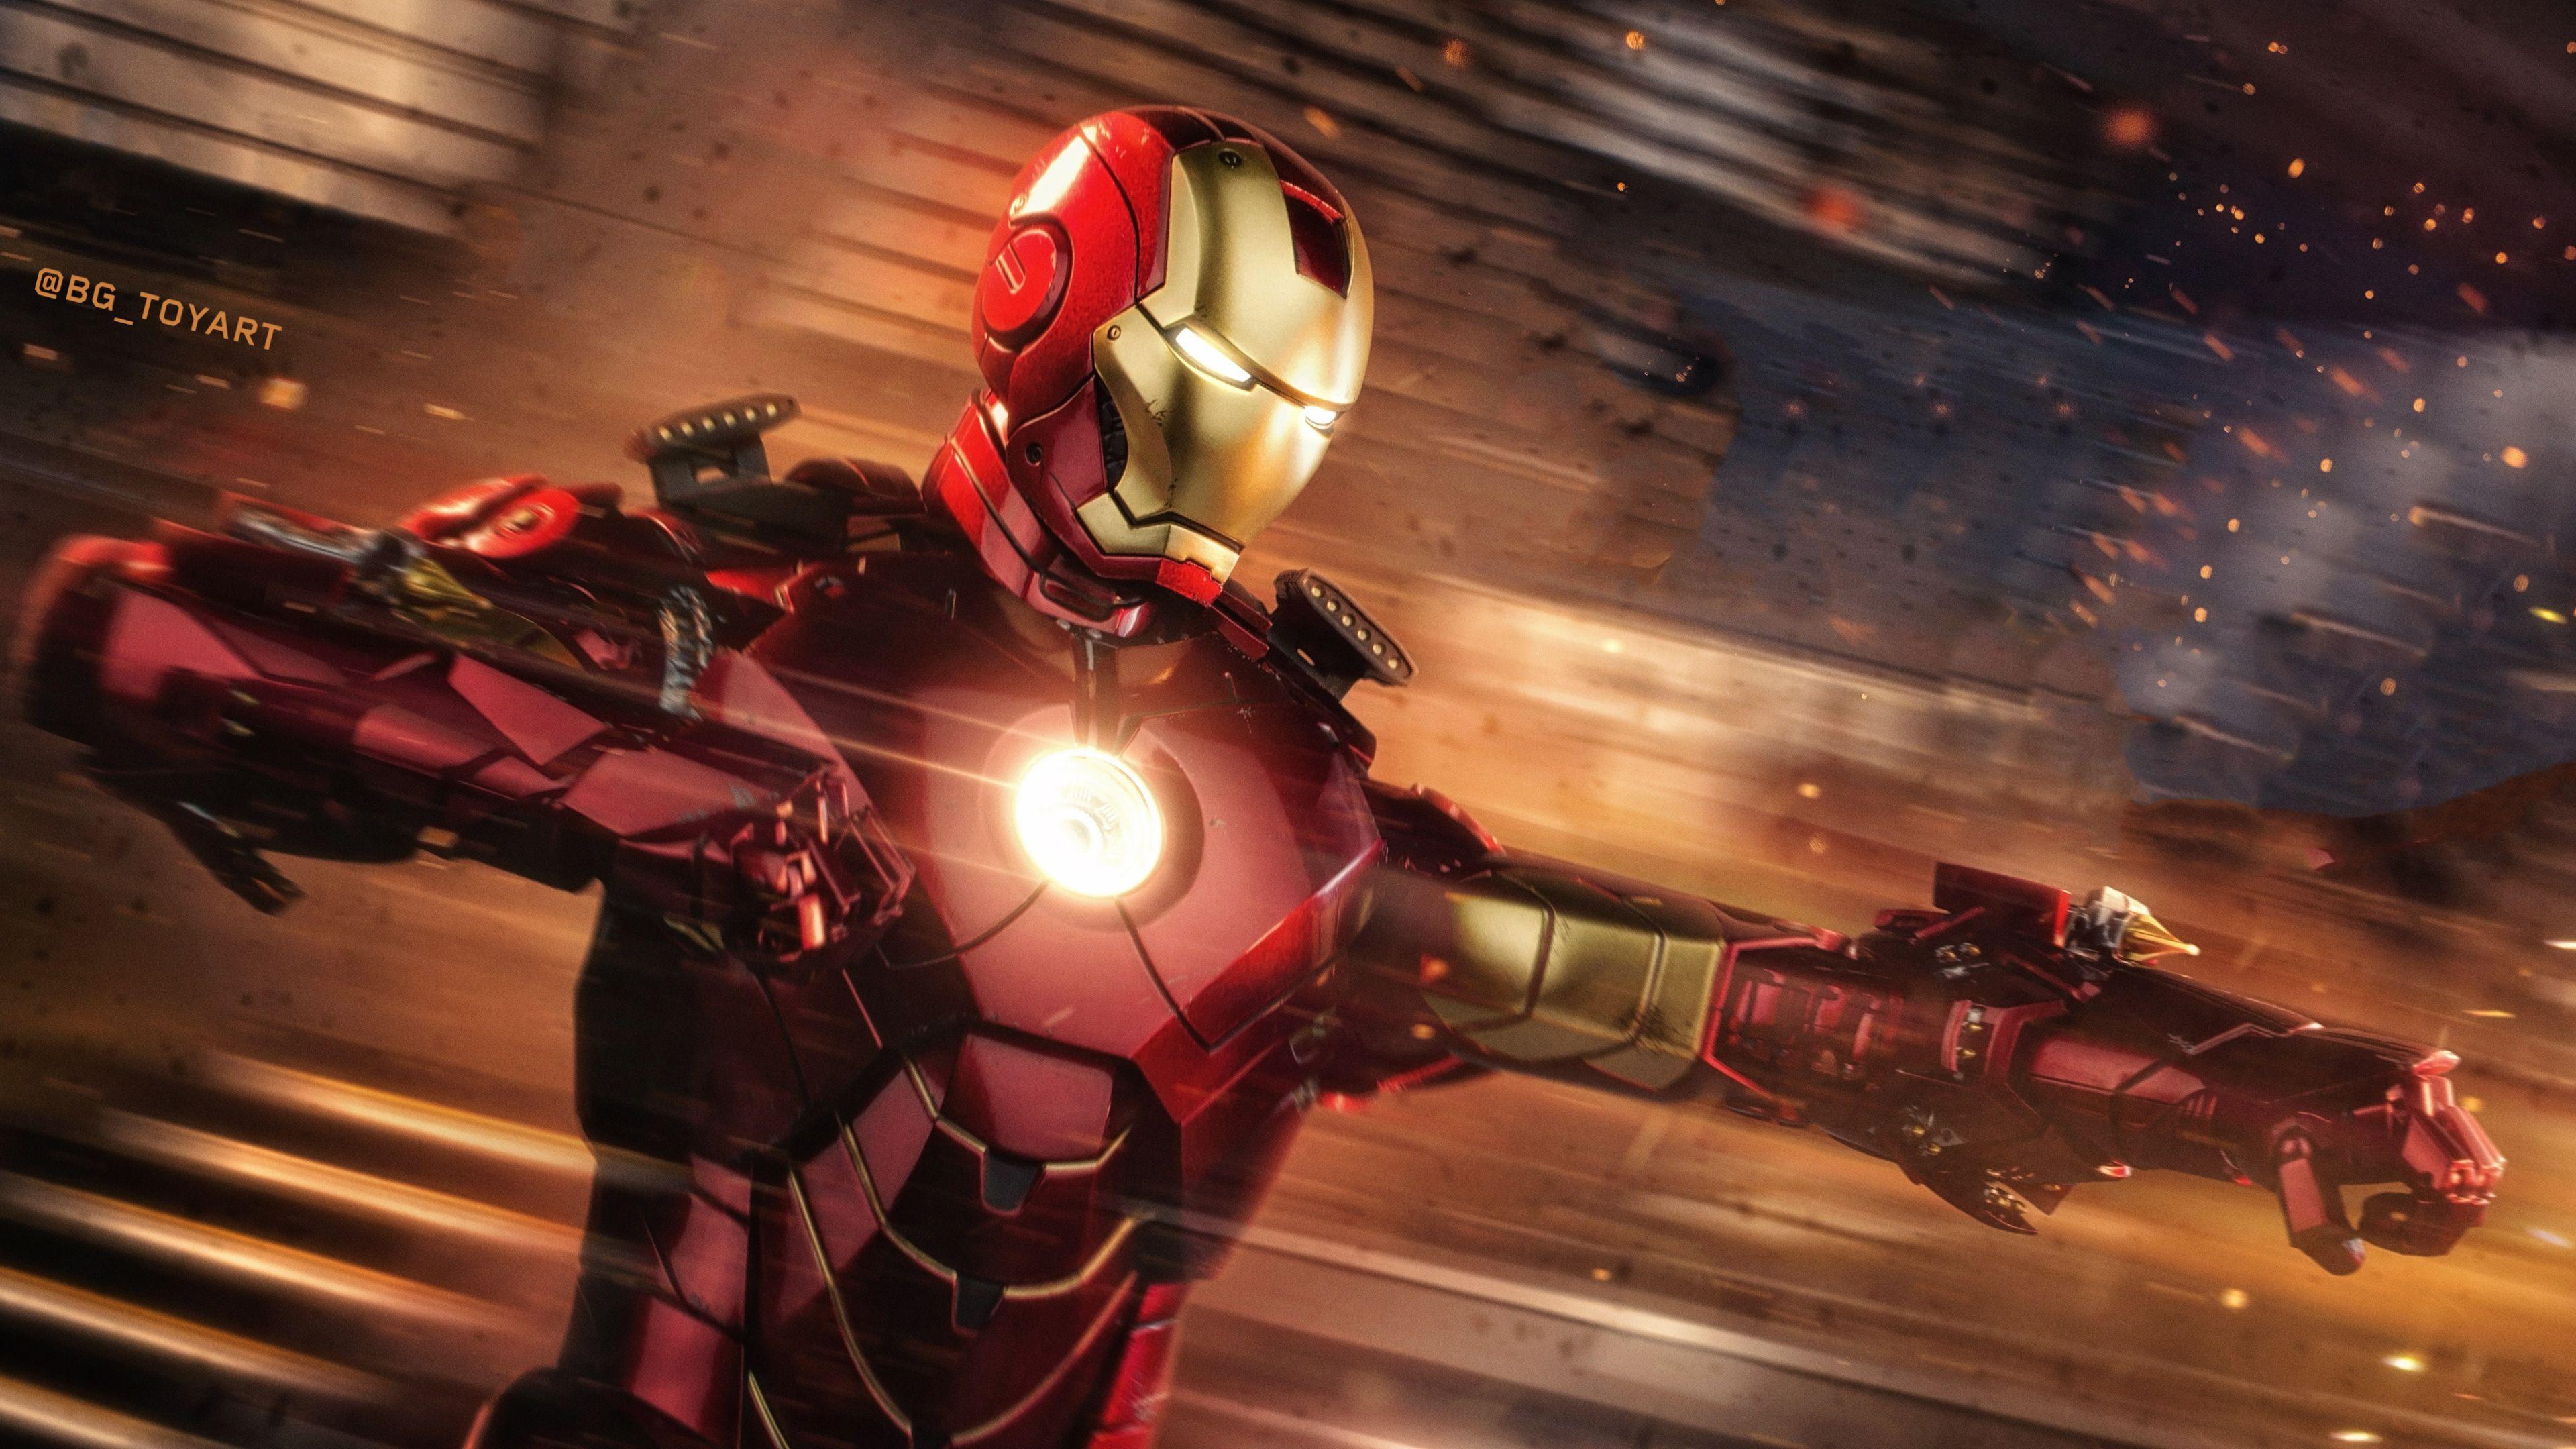 5k Iron Man 2018 Art Superheroes Wallpapers Iron Man Wallpapers Hd Wallpapers 5k Wallpapers 4k Wallpapers Iron Man Wallpapers Iron Man 5k Wallpaper